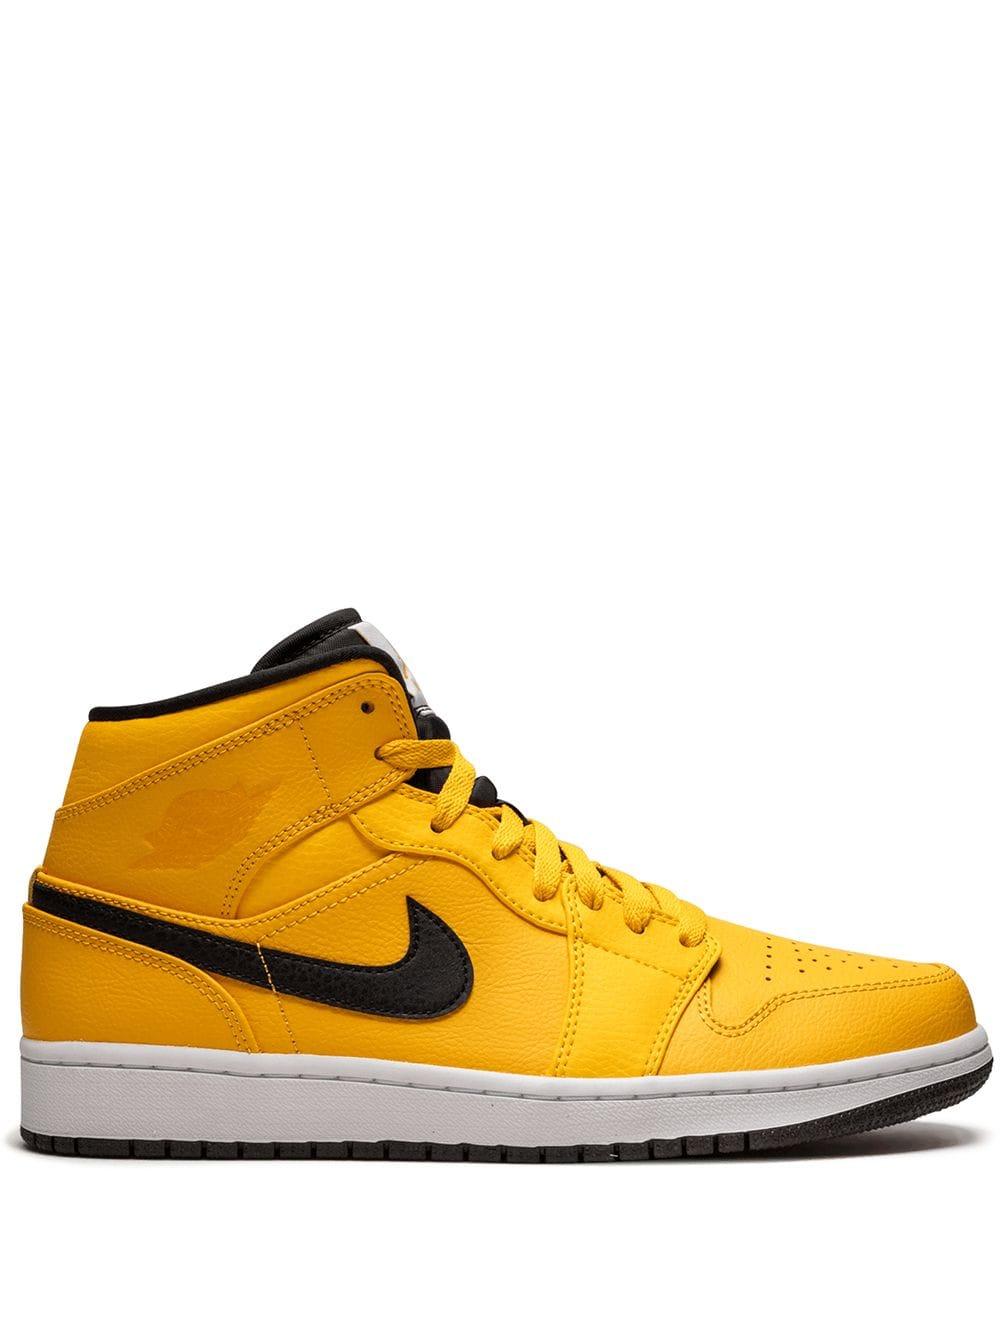 yellow jordans 1